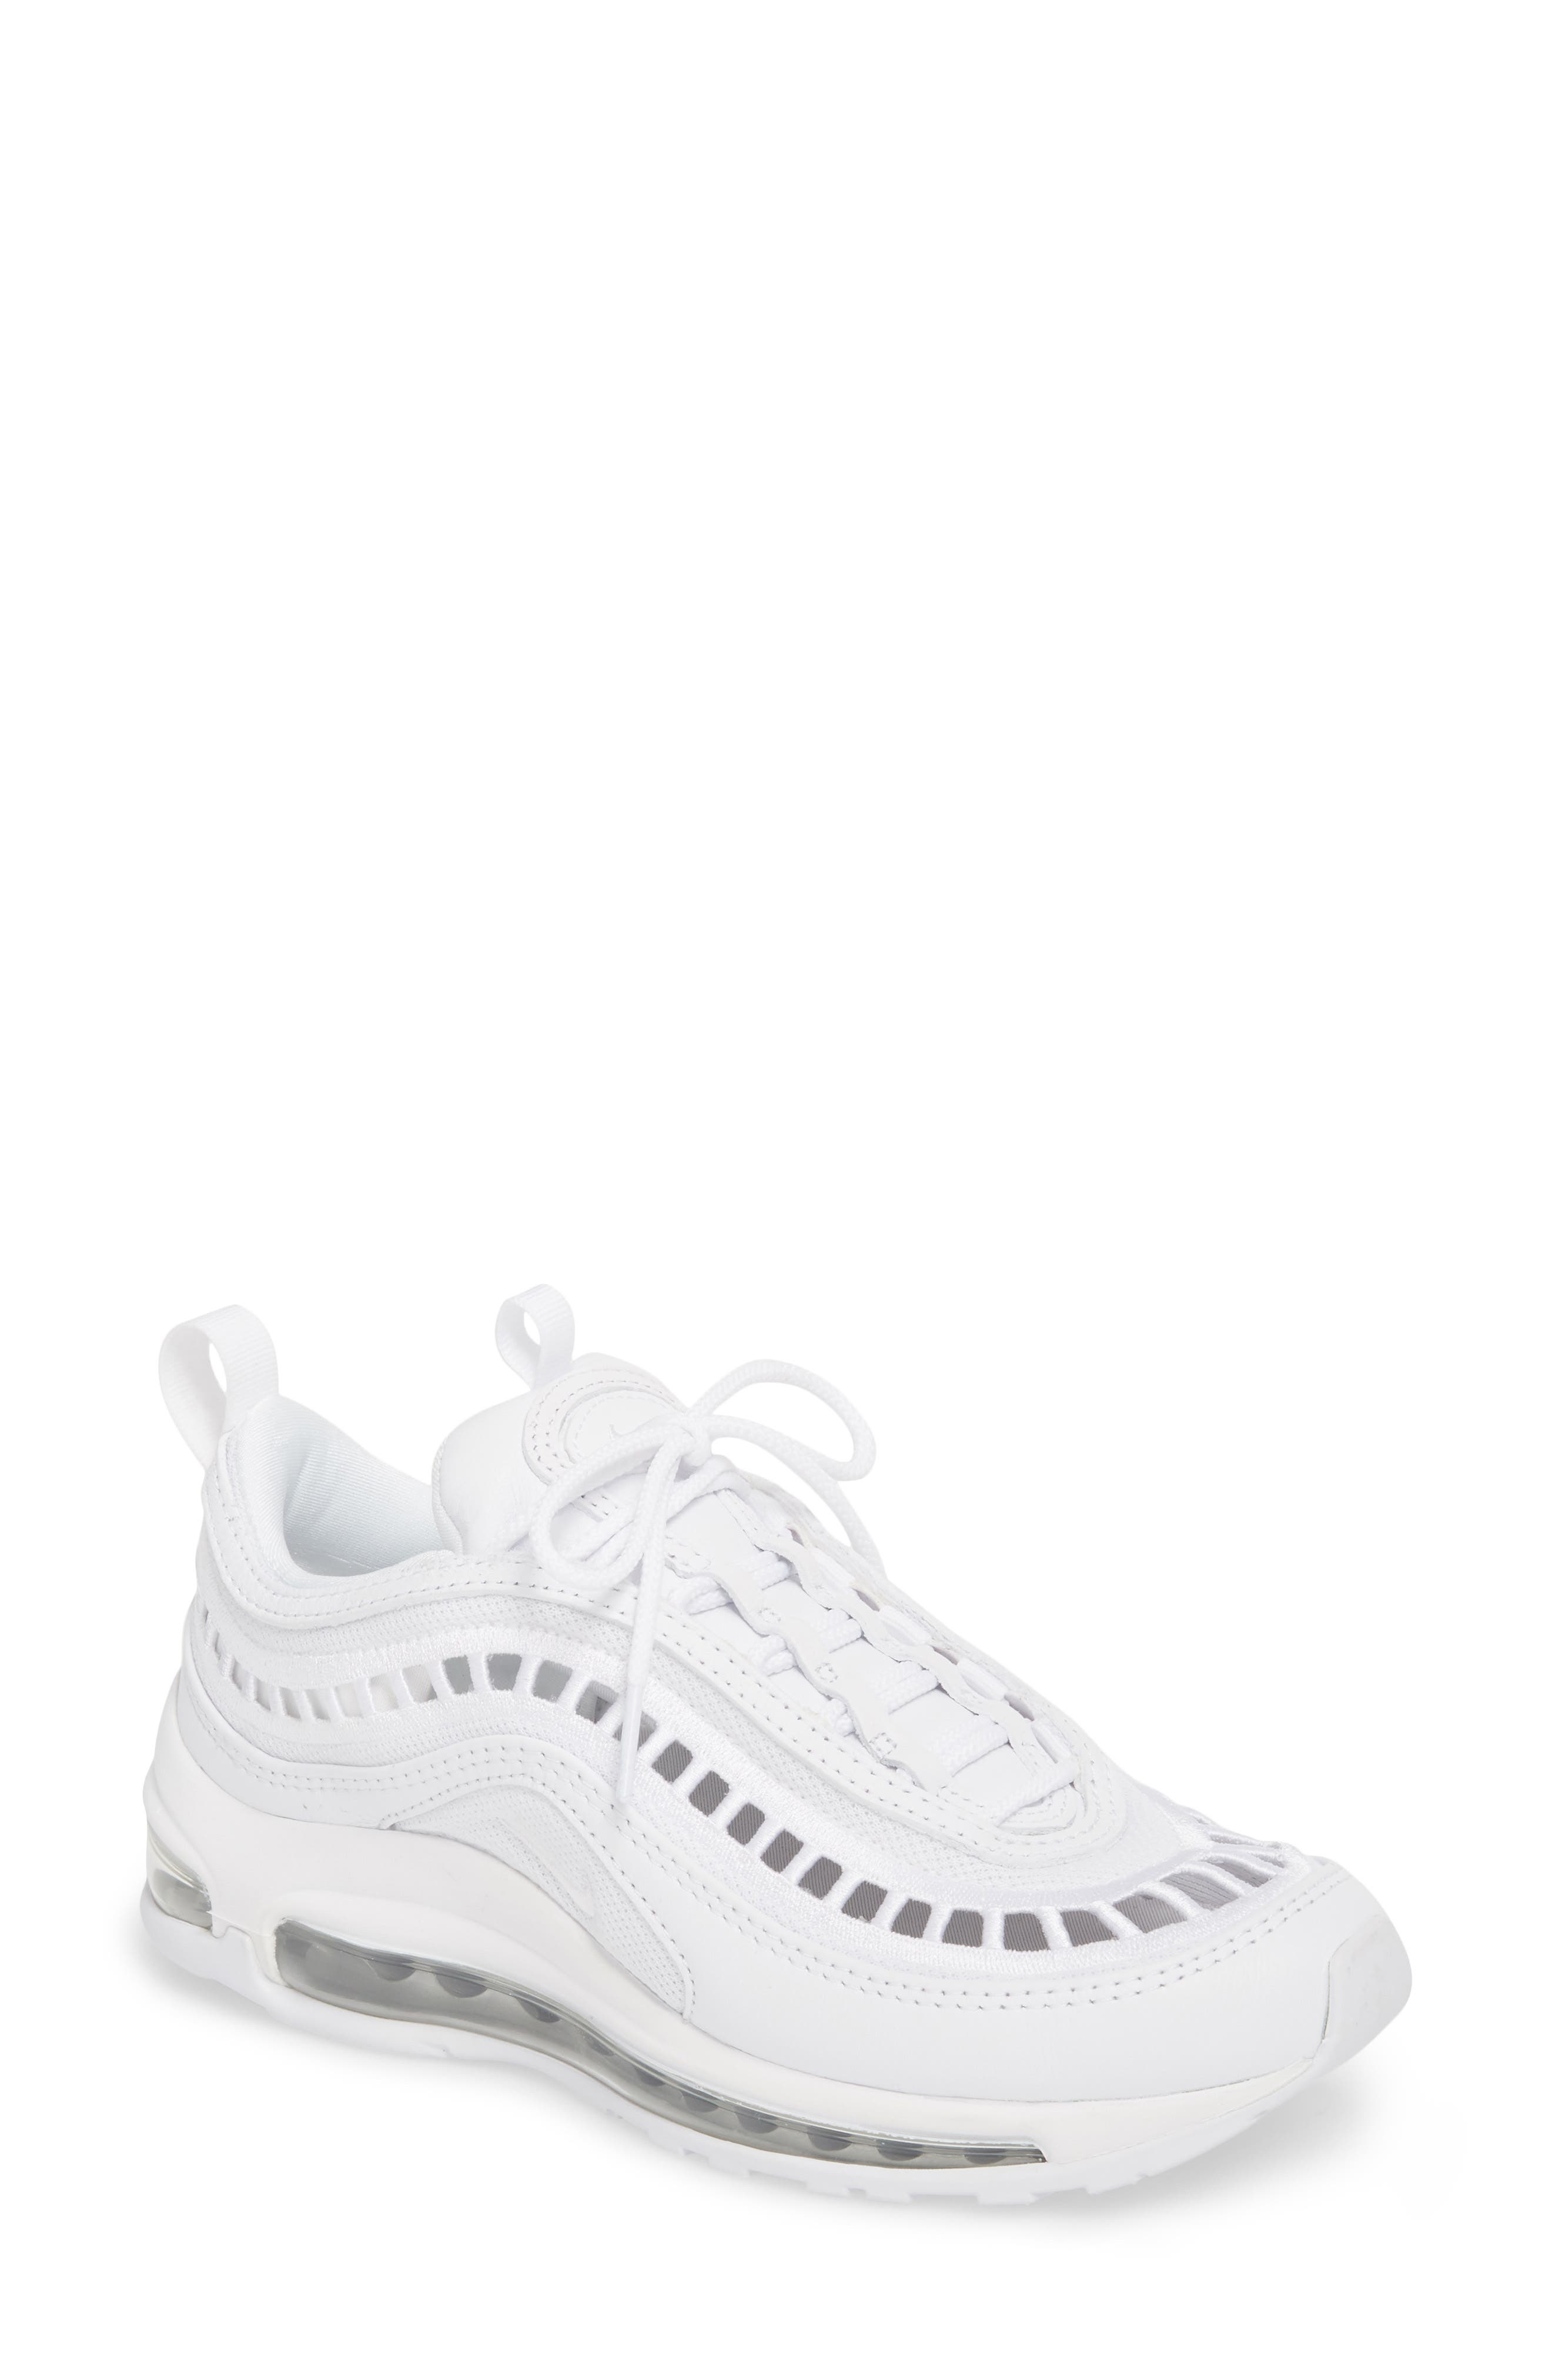 Air Max 97 Ultra '17 SI Sneaker,                             Main thumbnail 1, color,                             WHITE/ WHITE/ VAST GREY